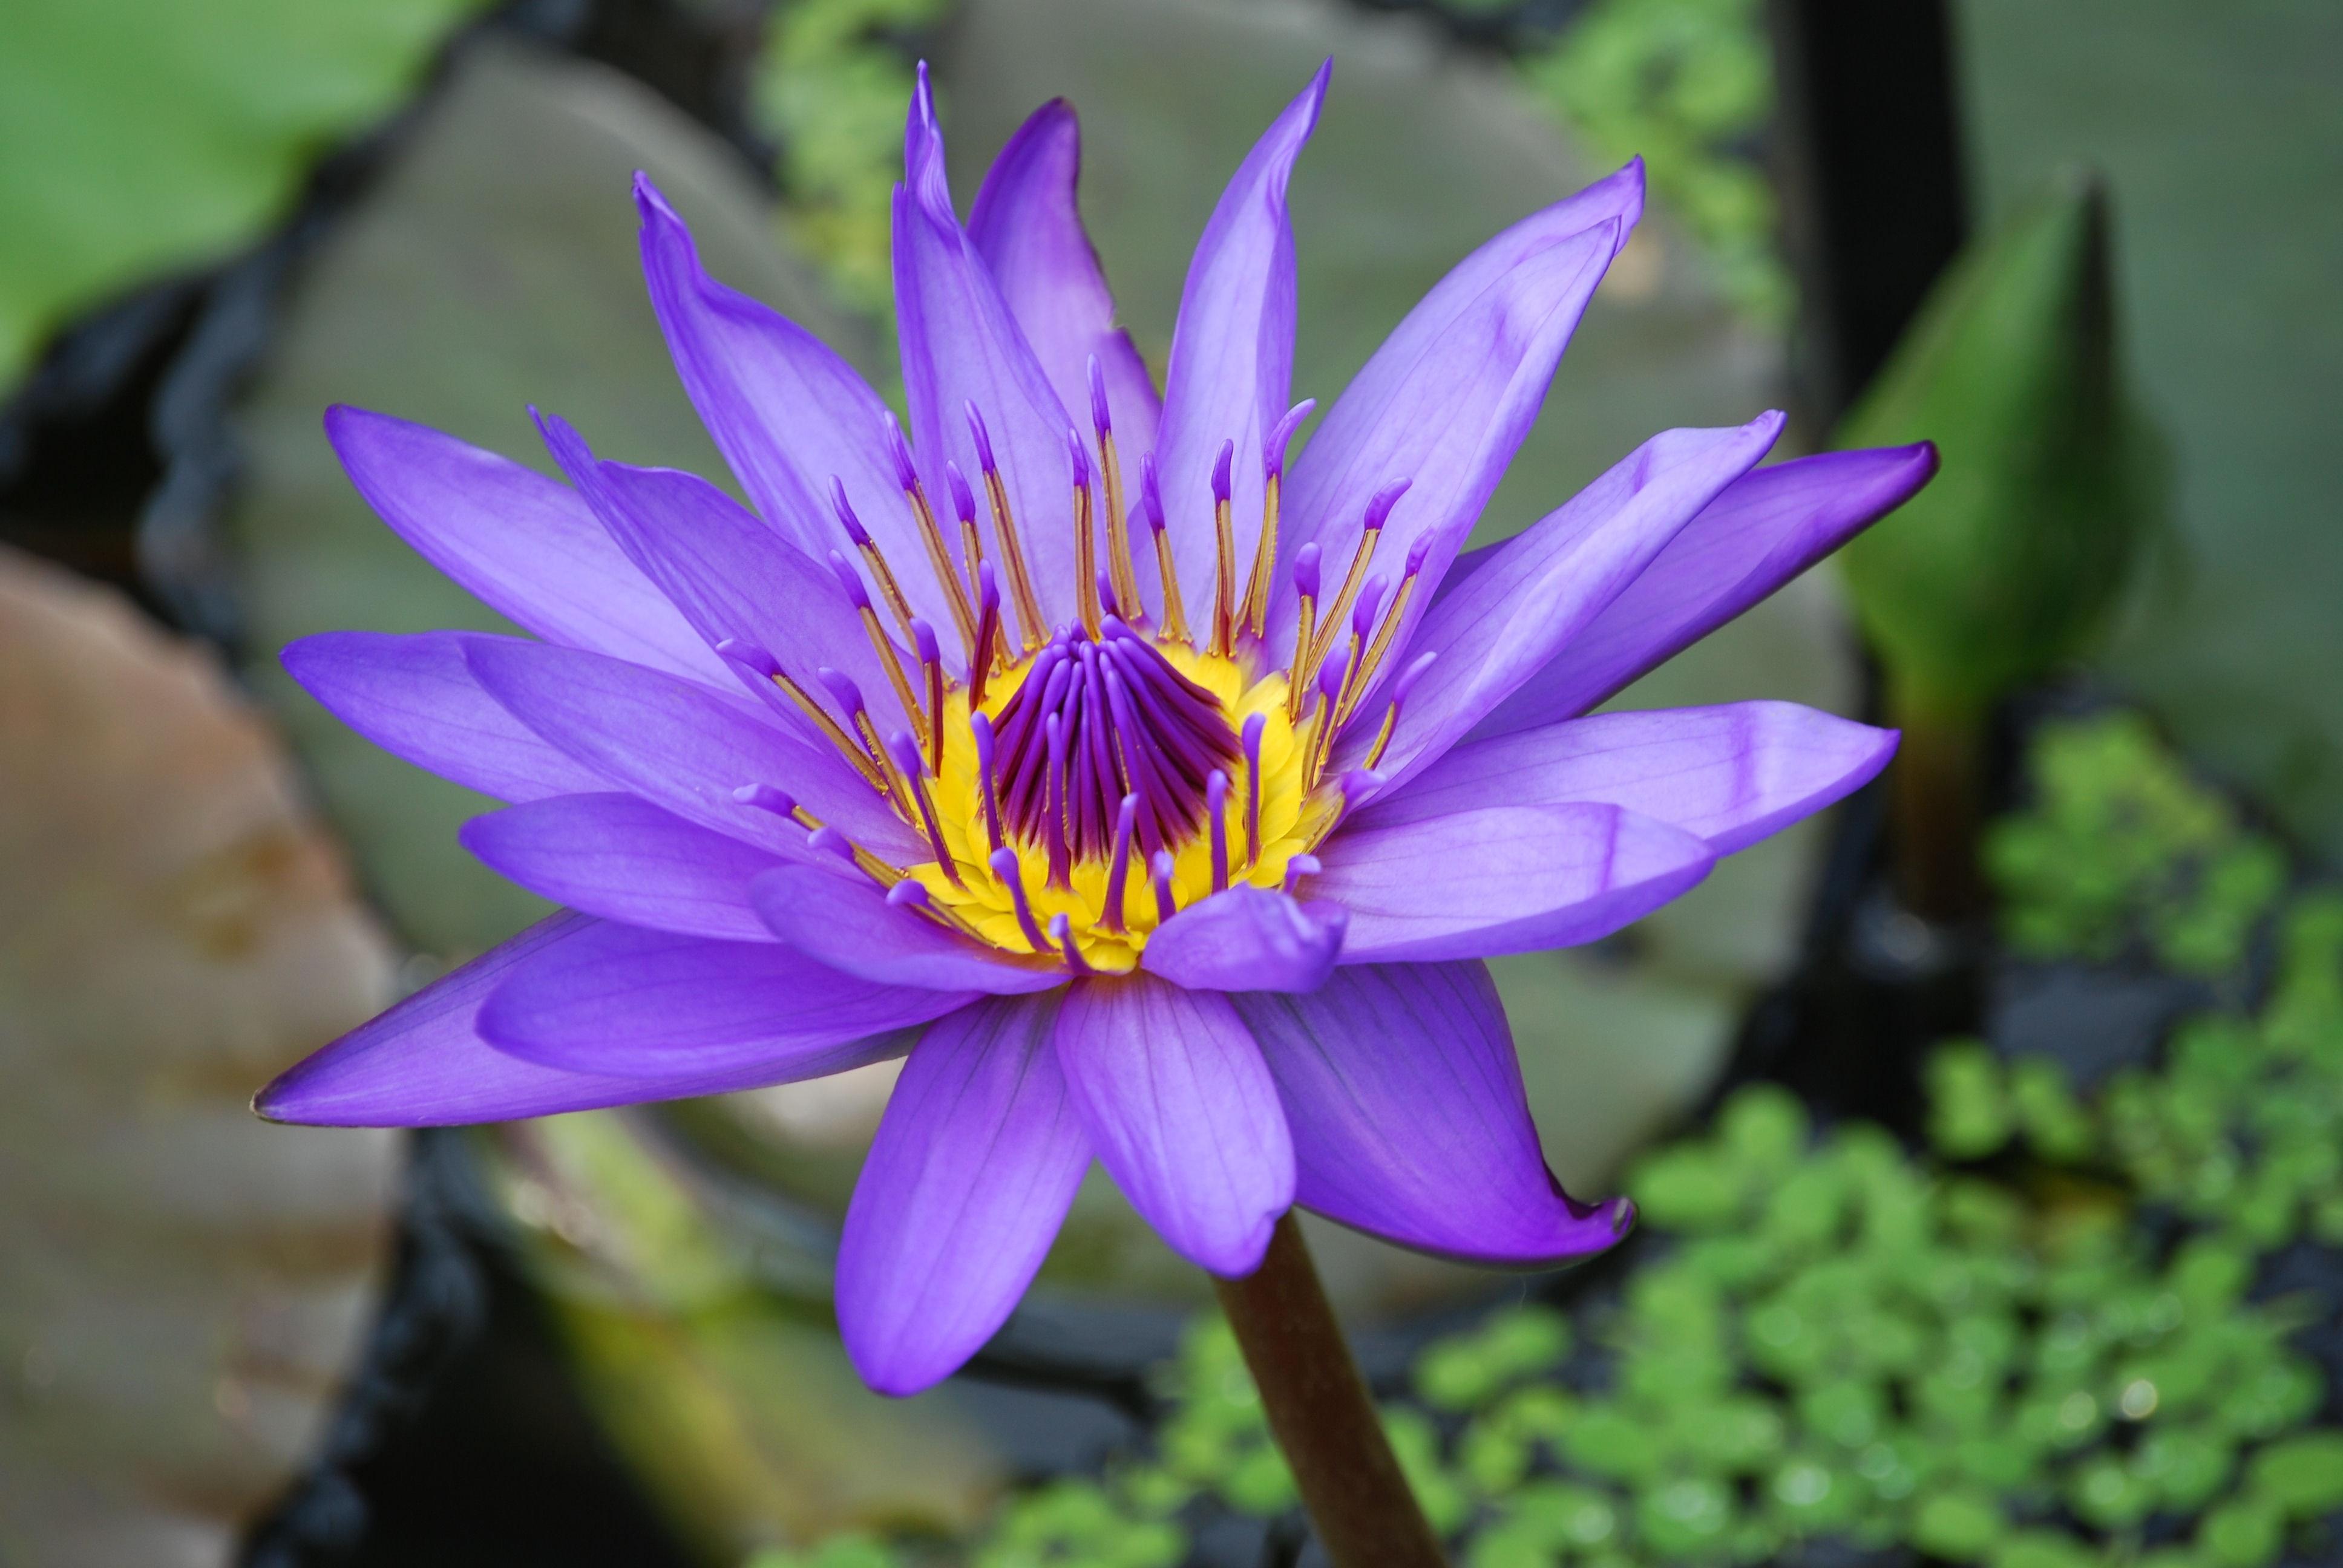 Purple and yellow lotus flower photo